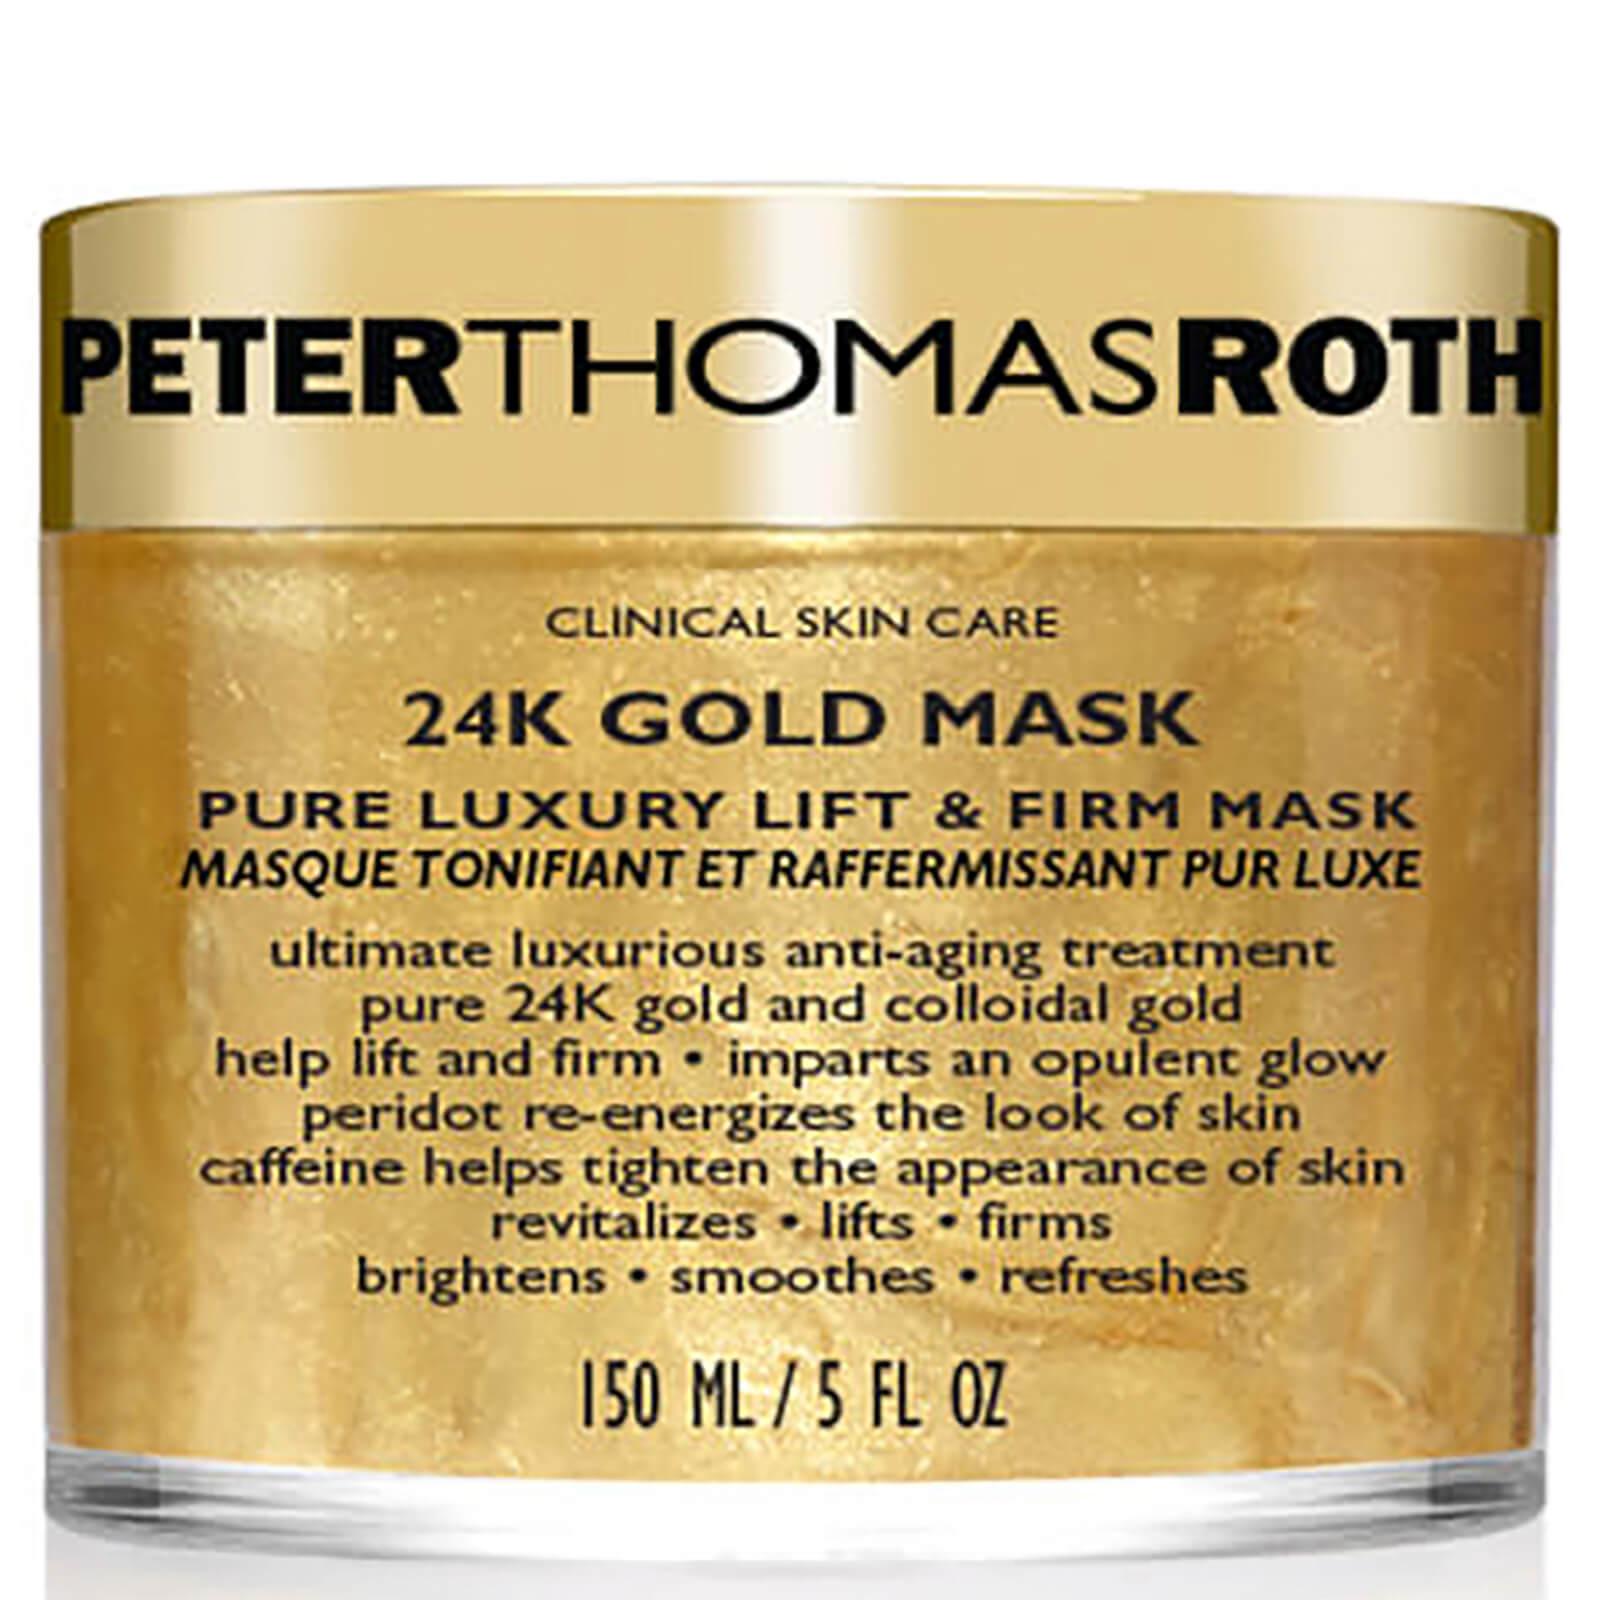 Peter Thomas Roth Peter Thomas Rith 24K Gold masque d'or